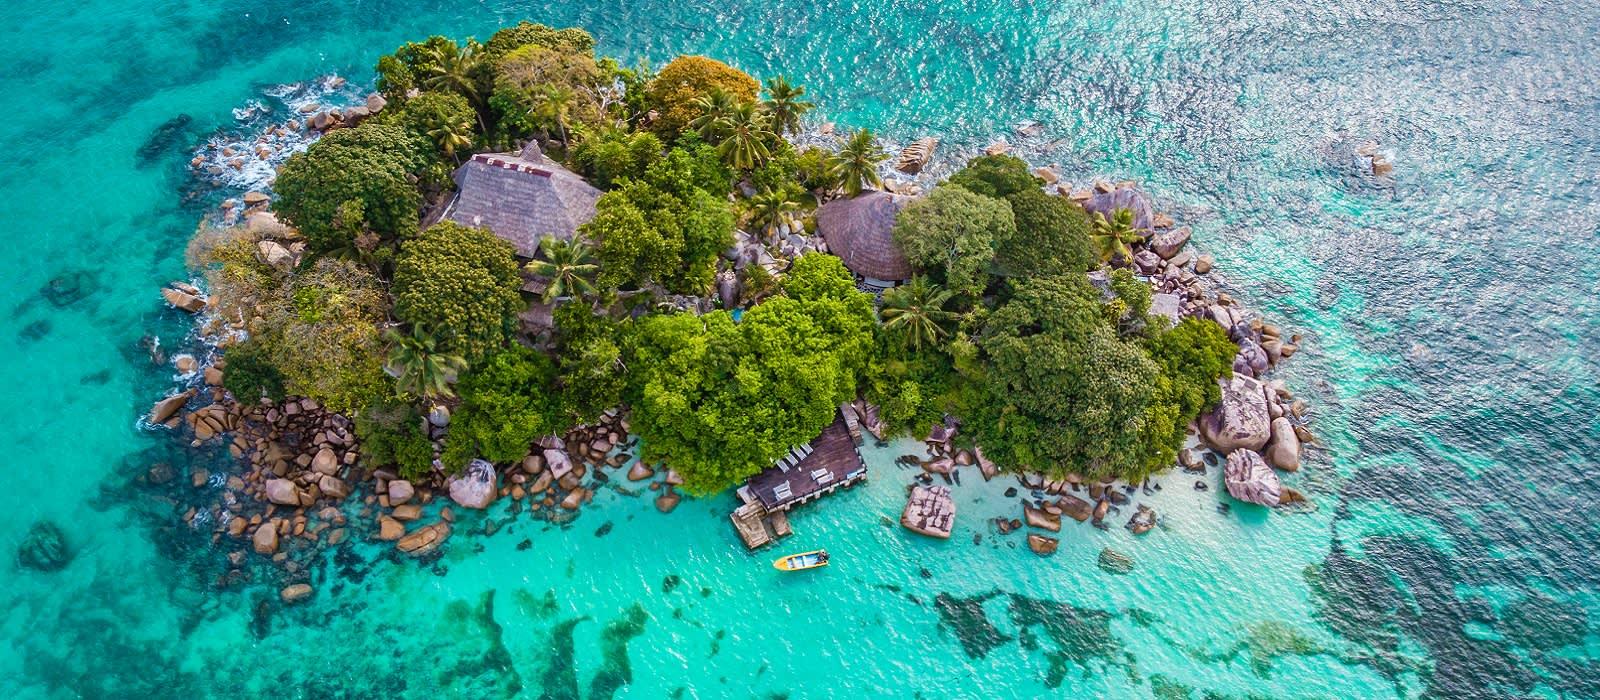 Seychelles beach holiday: Praslin tropical island Seychelles, drone view above st piere island Seychelles